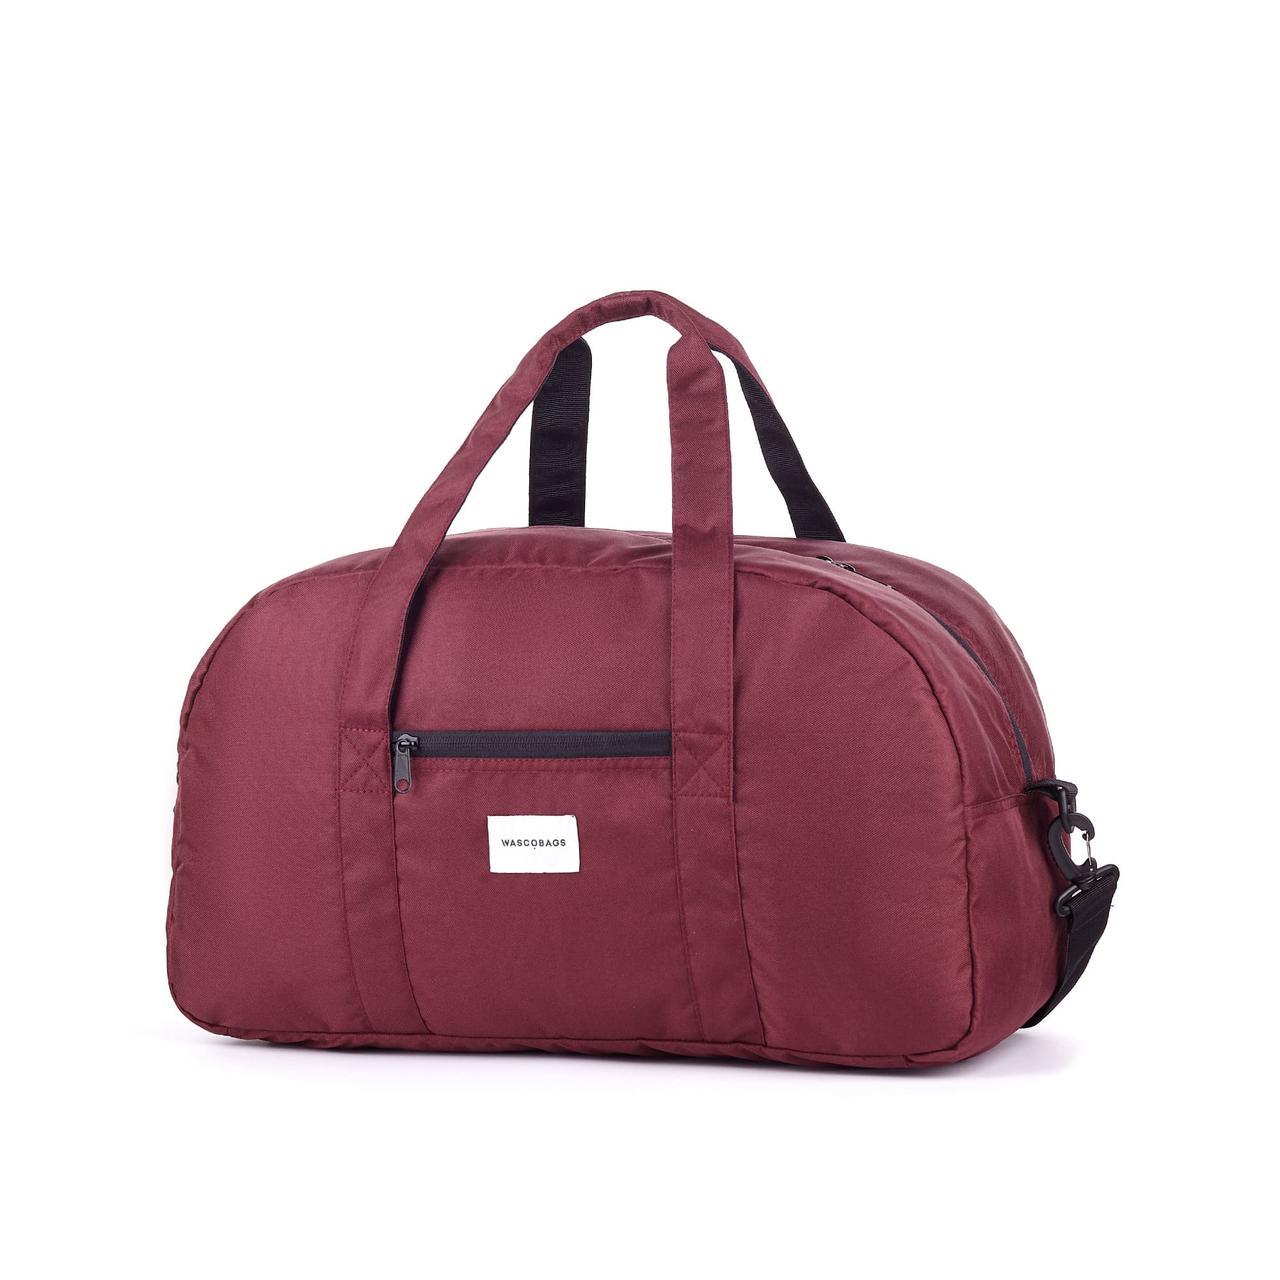 Дорожная сумка Wascobags Vienna Бордо (36 L)